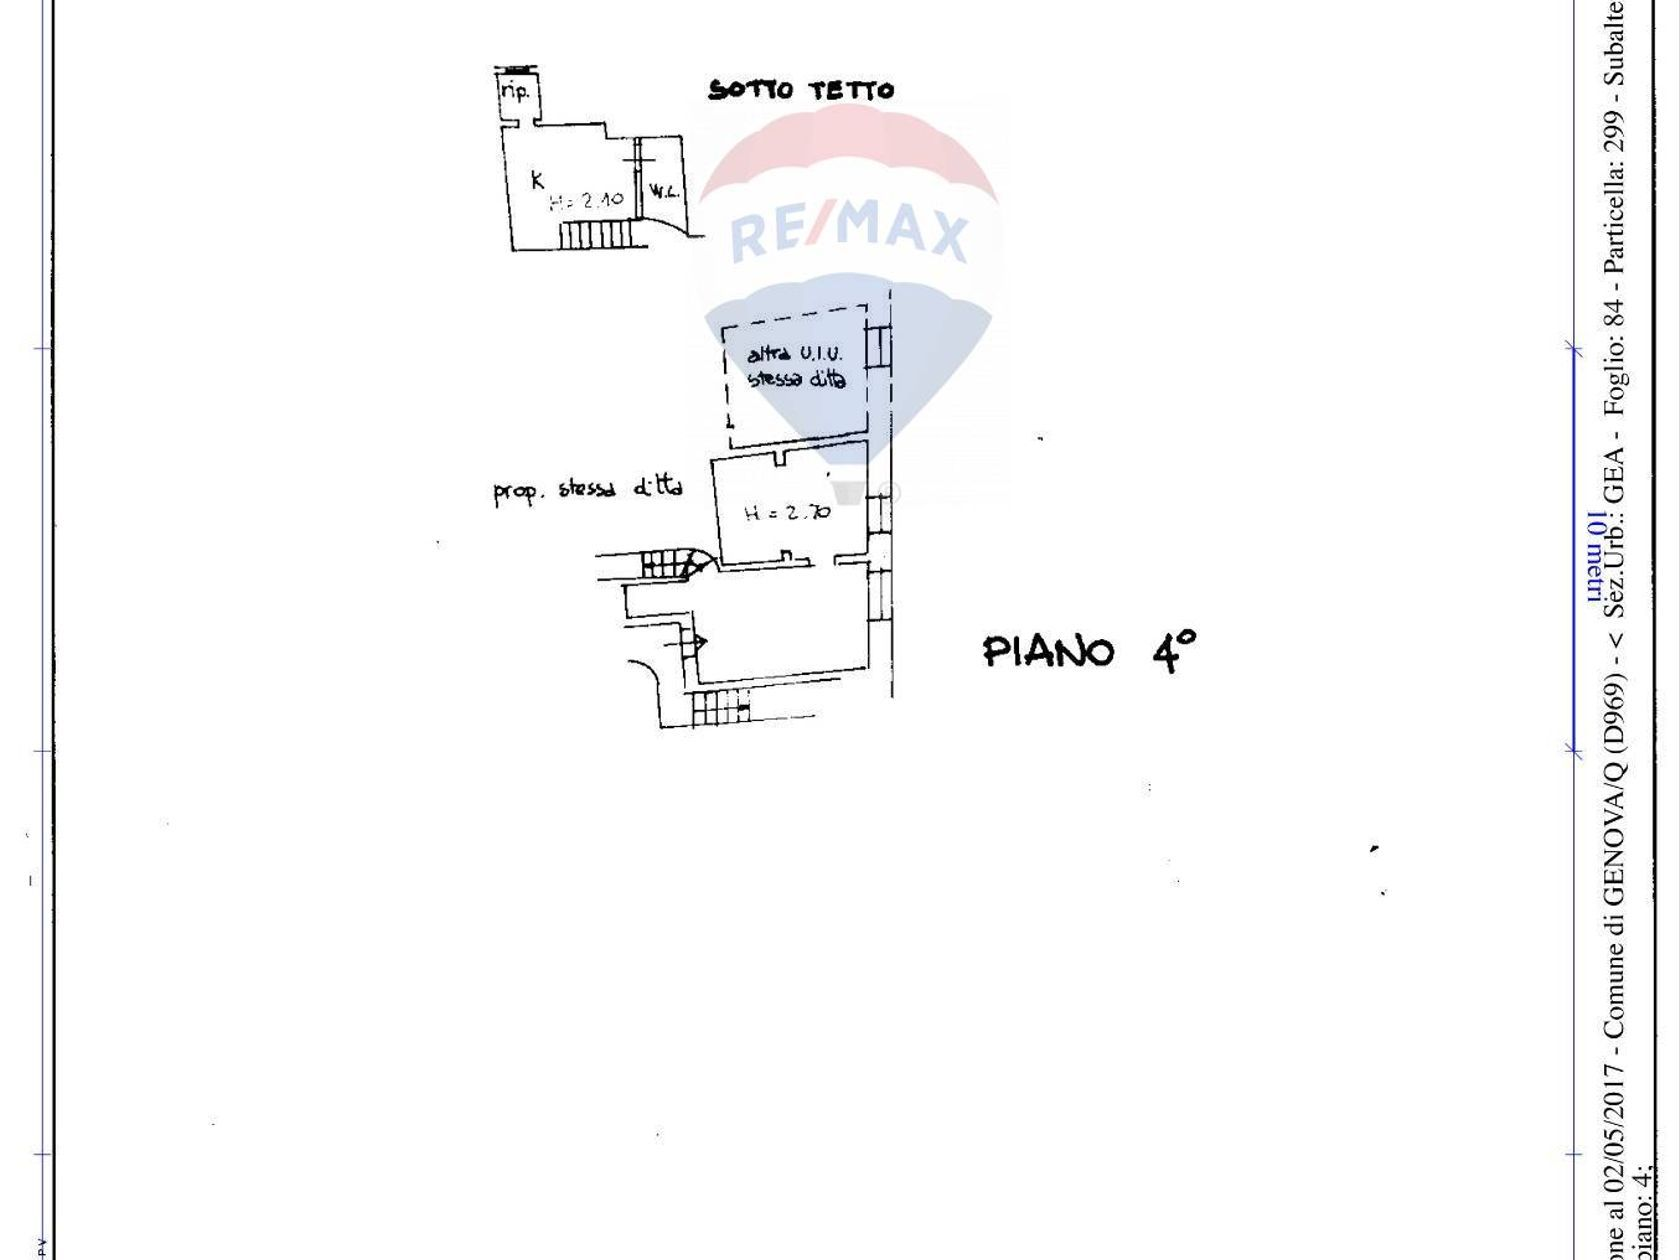 Appartamento Centro Storico, Genova, GE Affitto - Planimetria 1